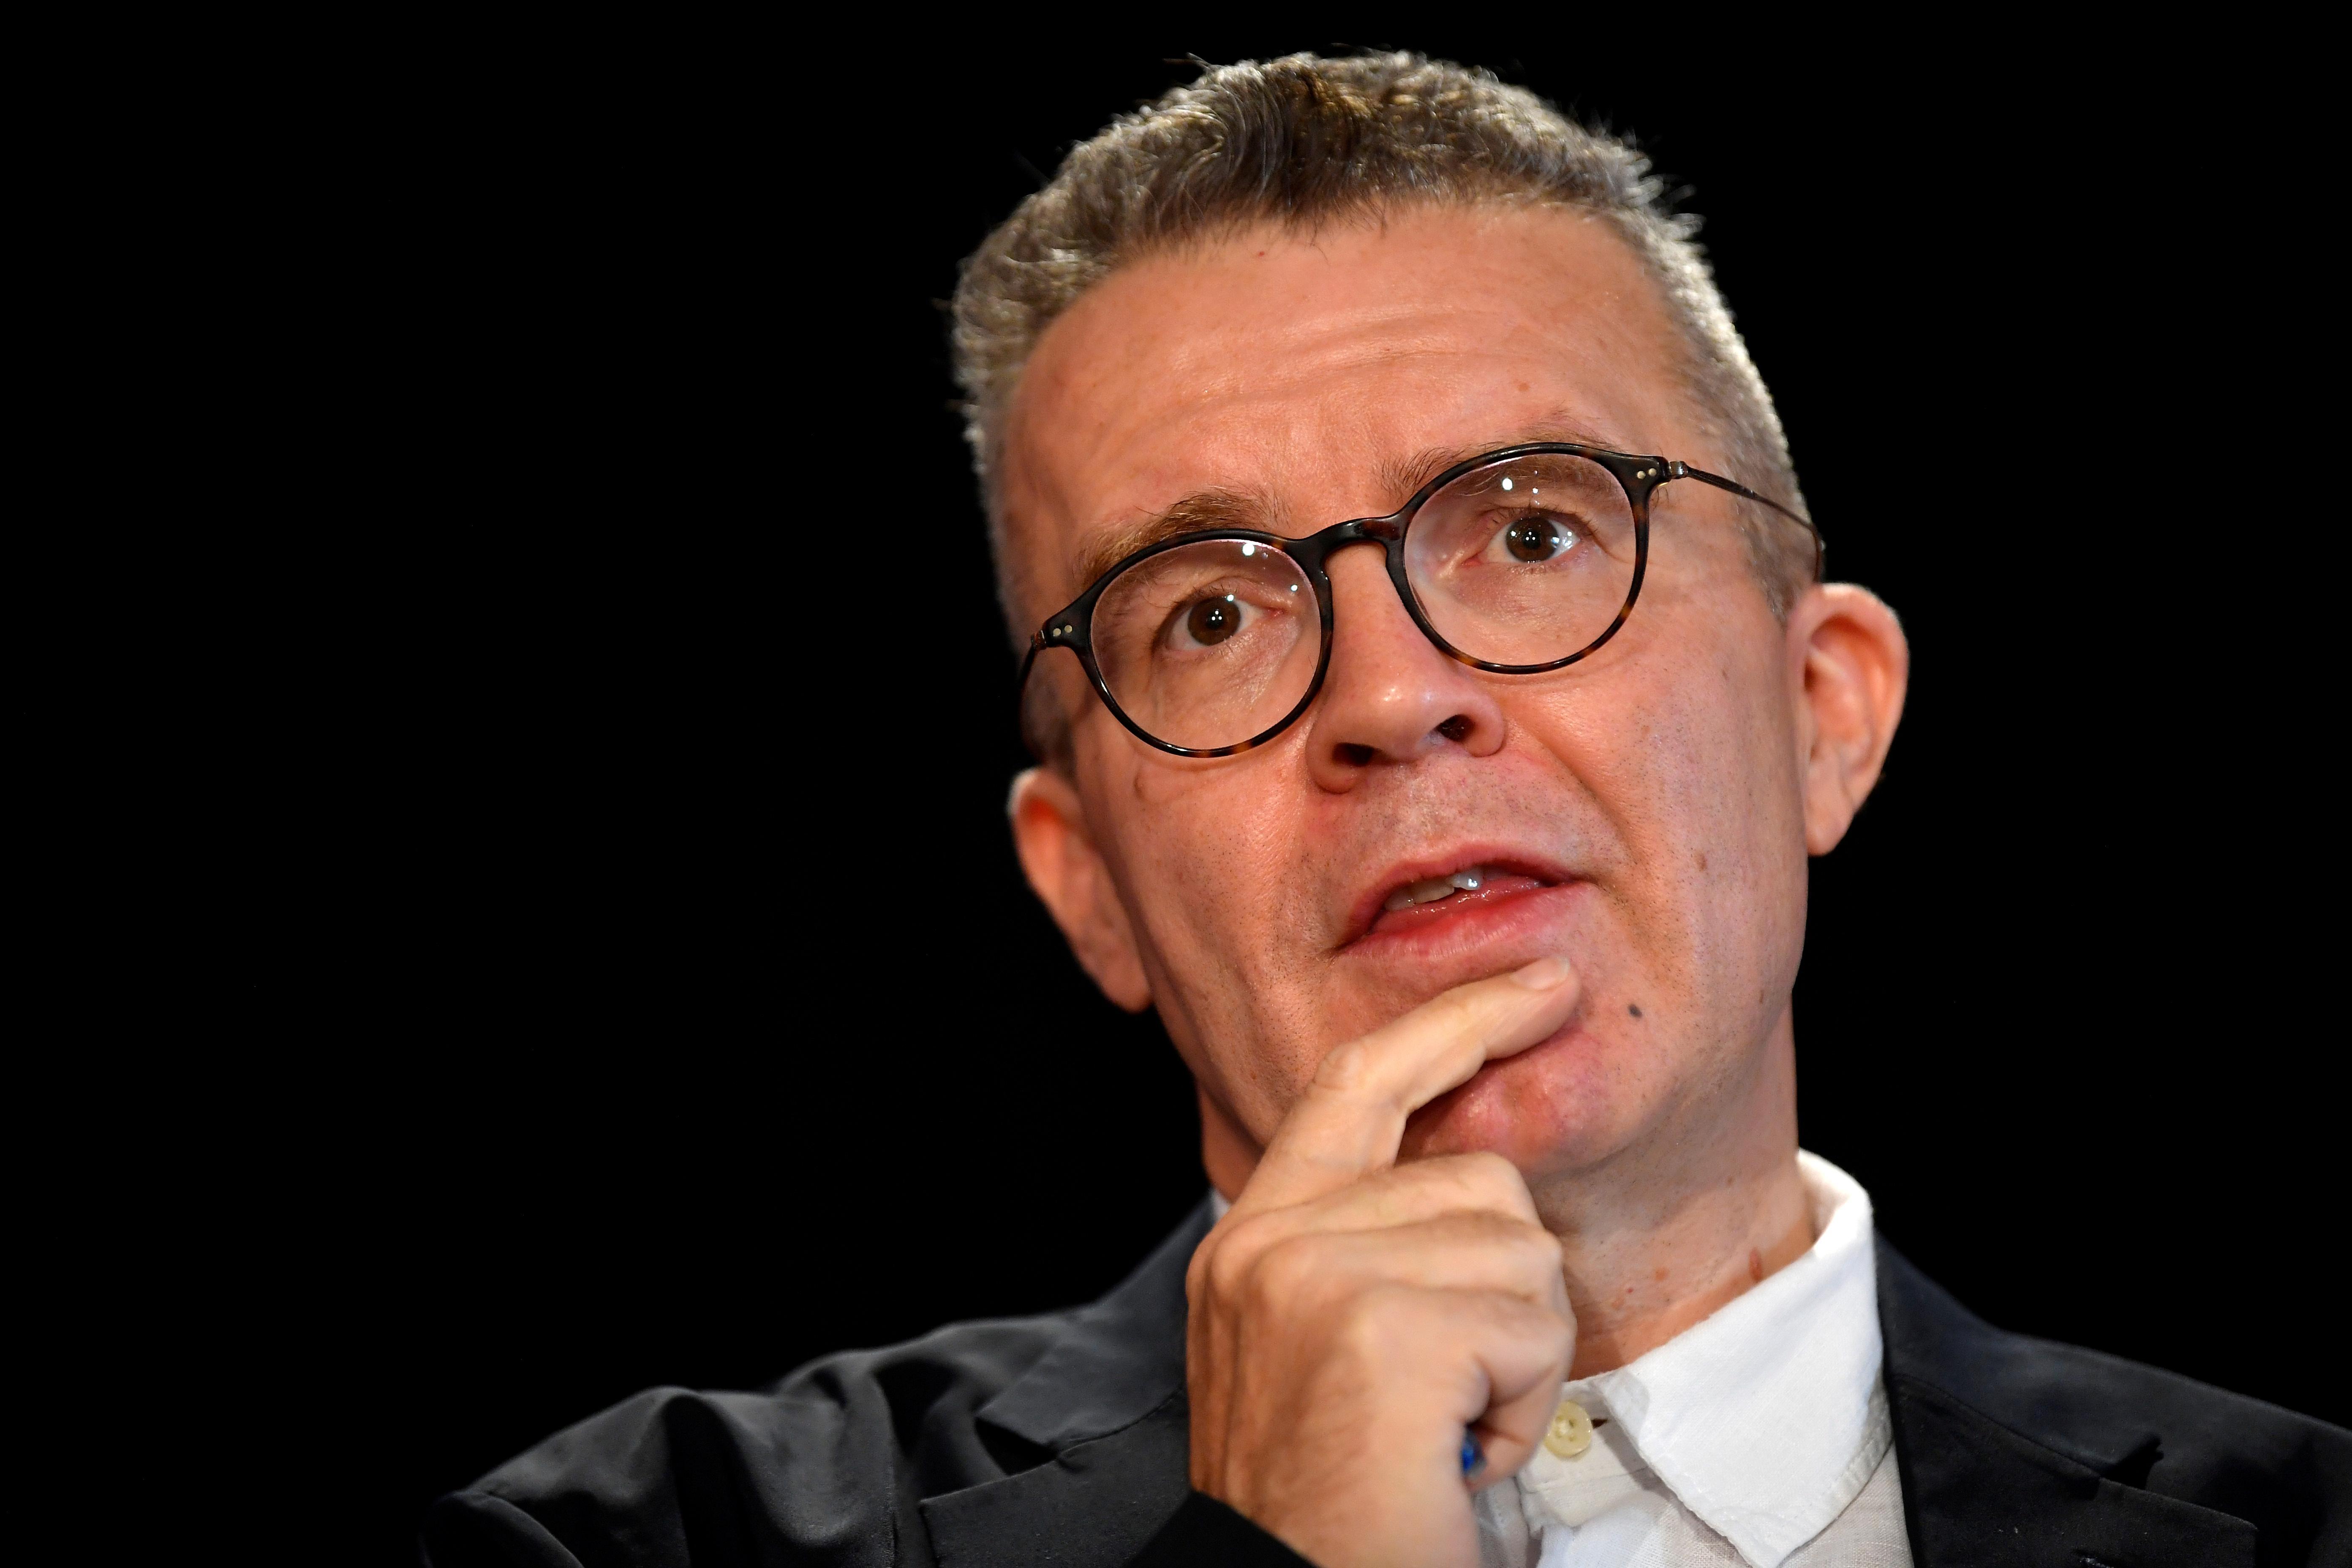 Labour deputy leader survives bid to oust him over Brexit